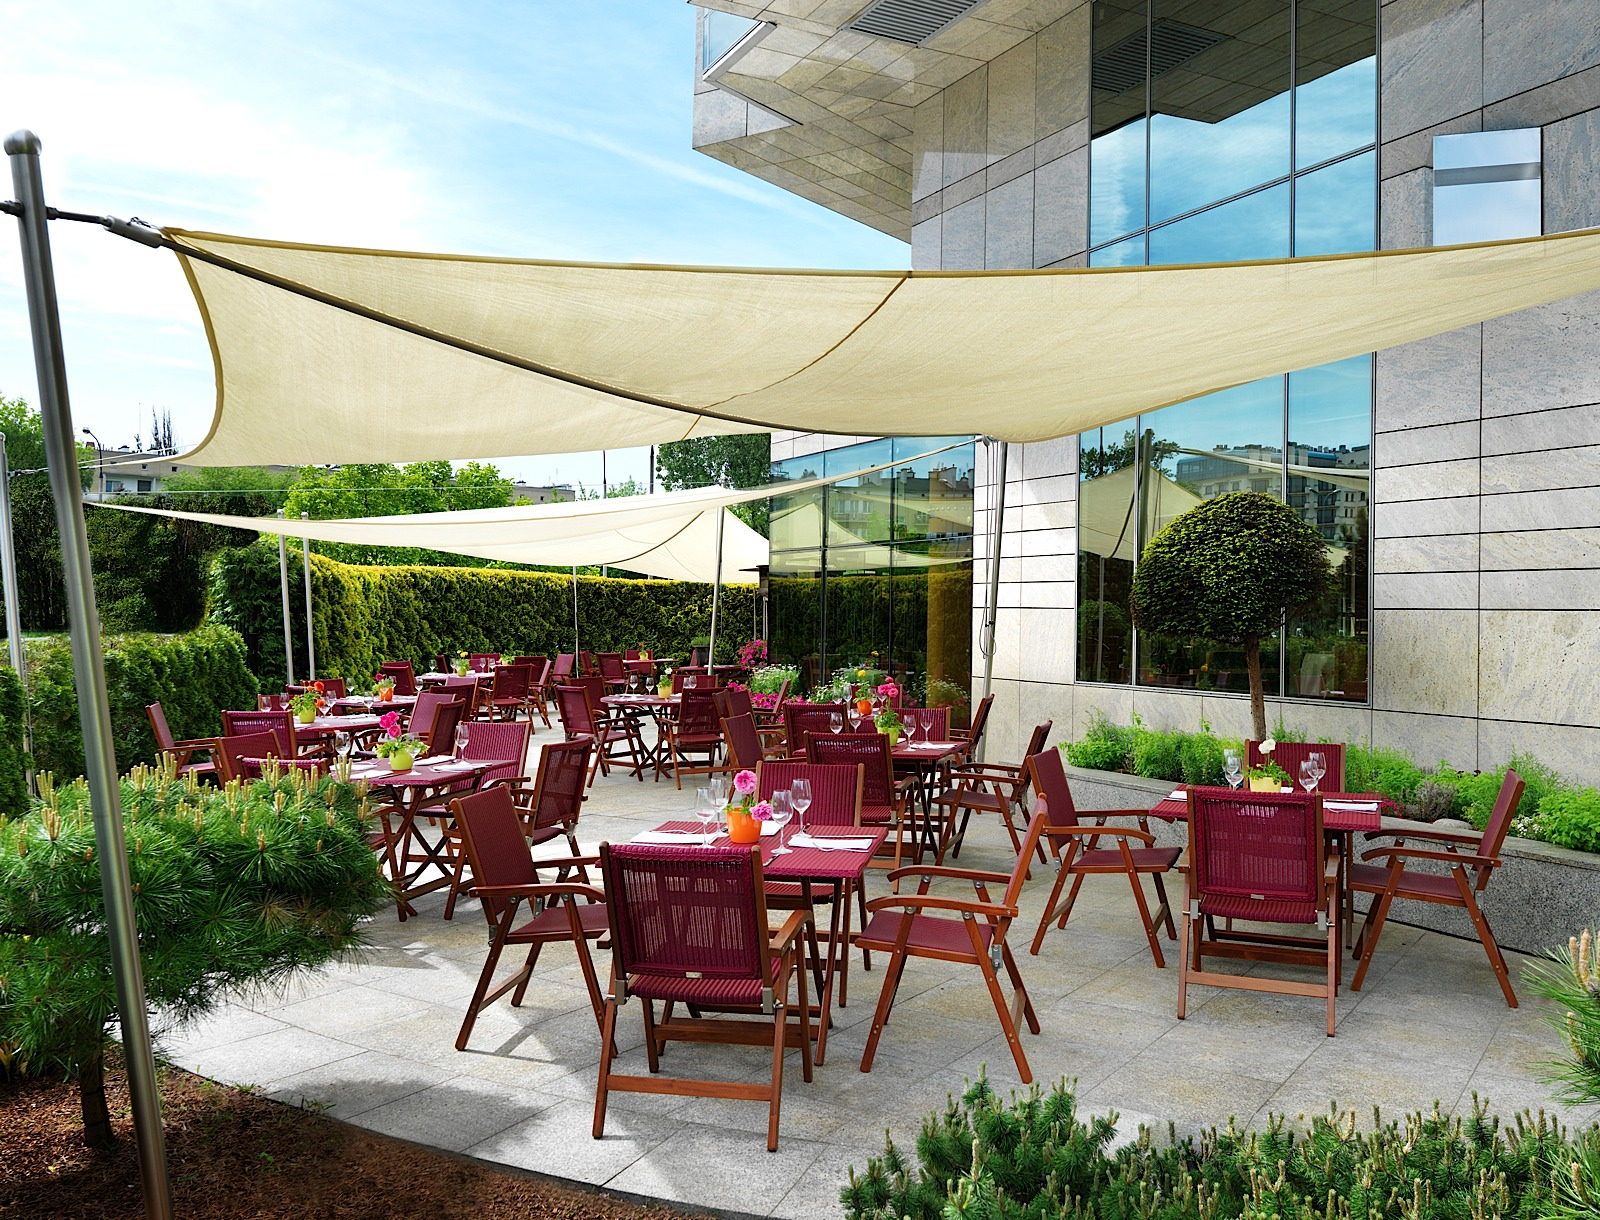 Hotel regent warsaw sala konferencyjna warszawa for Open terrace restaurants